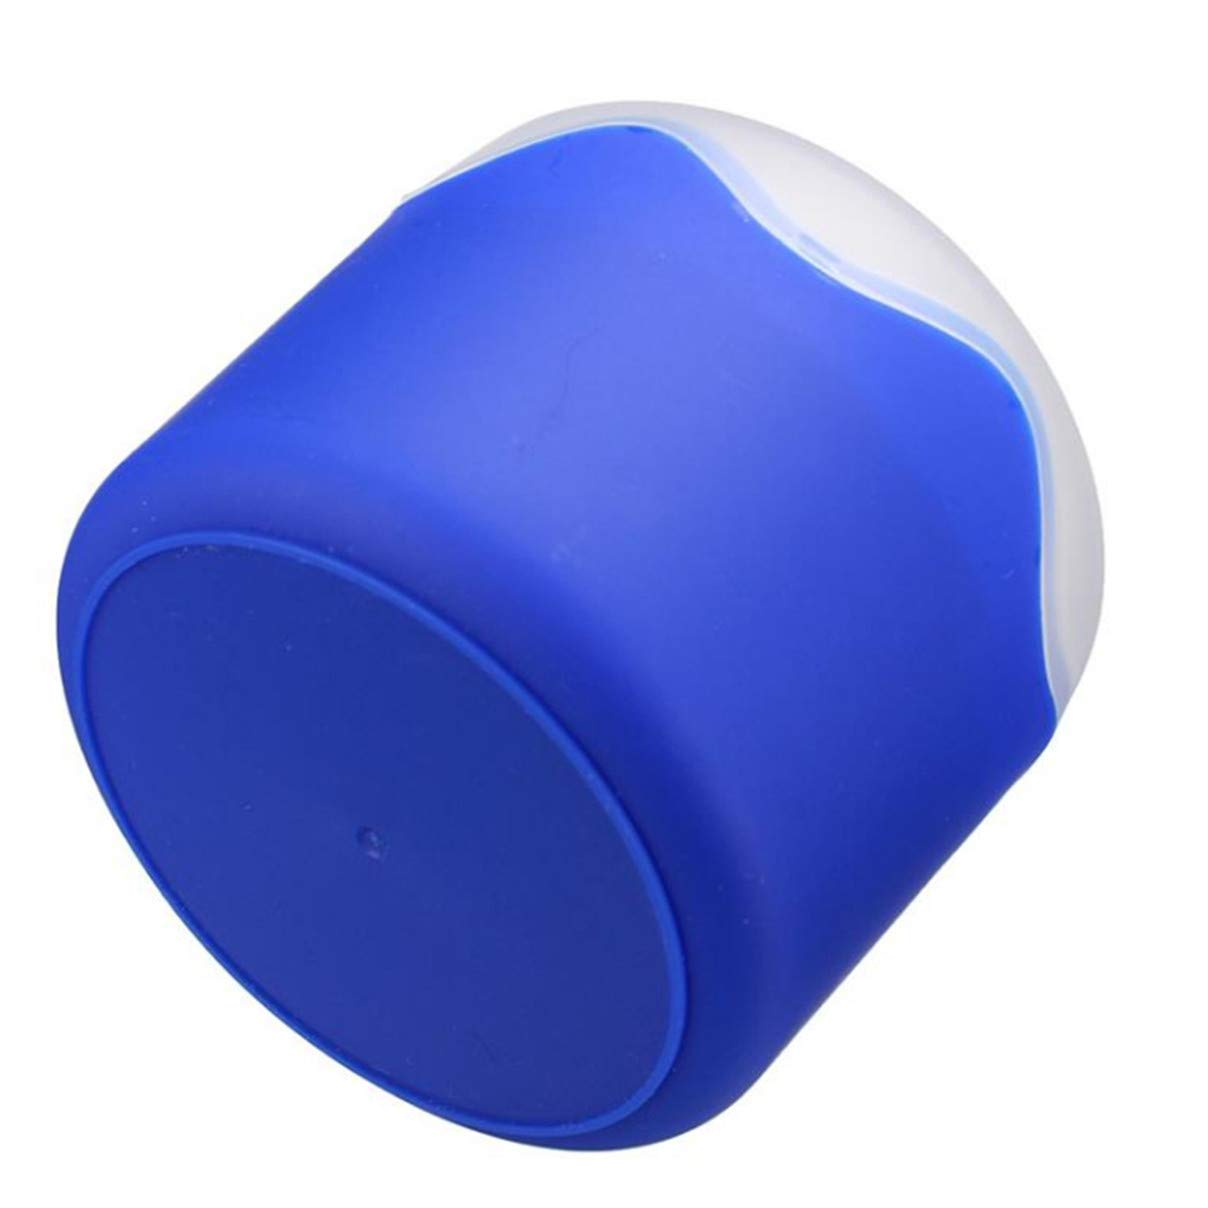 Essencedelight Storage Case Portable Round Watch Traveler's Organizer Holder Storage Display Colorful Showcase Jewelry Box